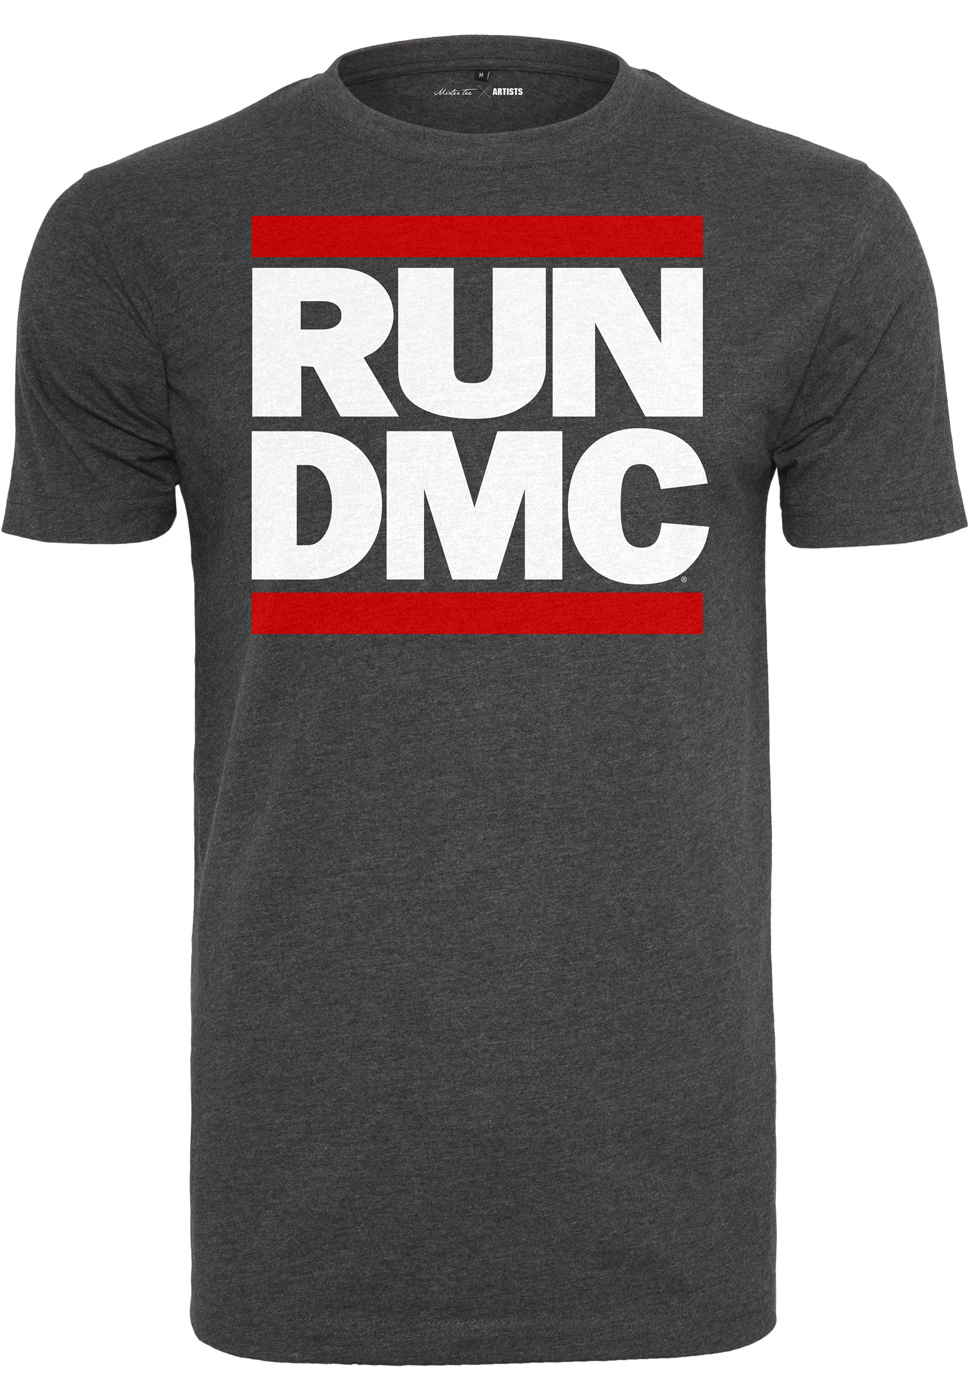 Run DMC Logo Tee